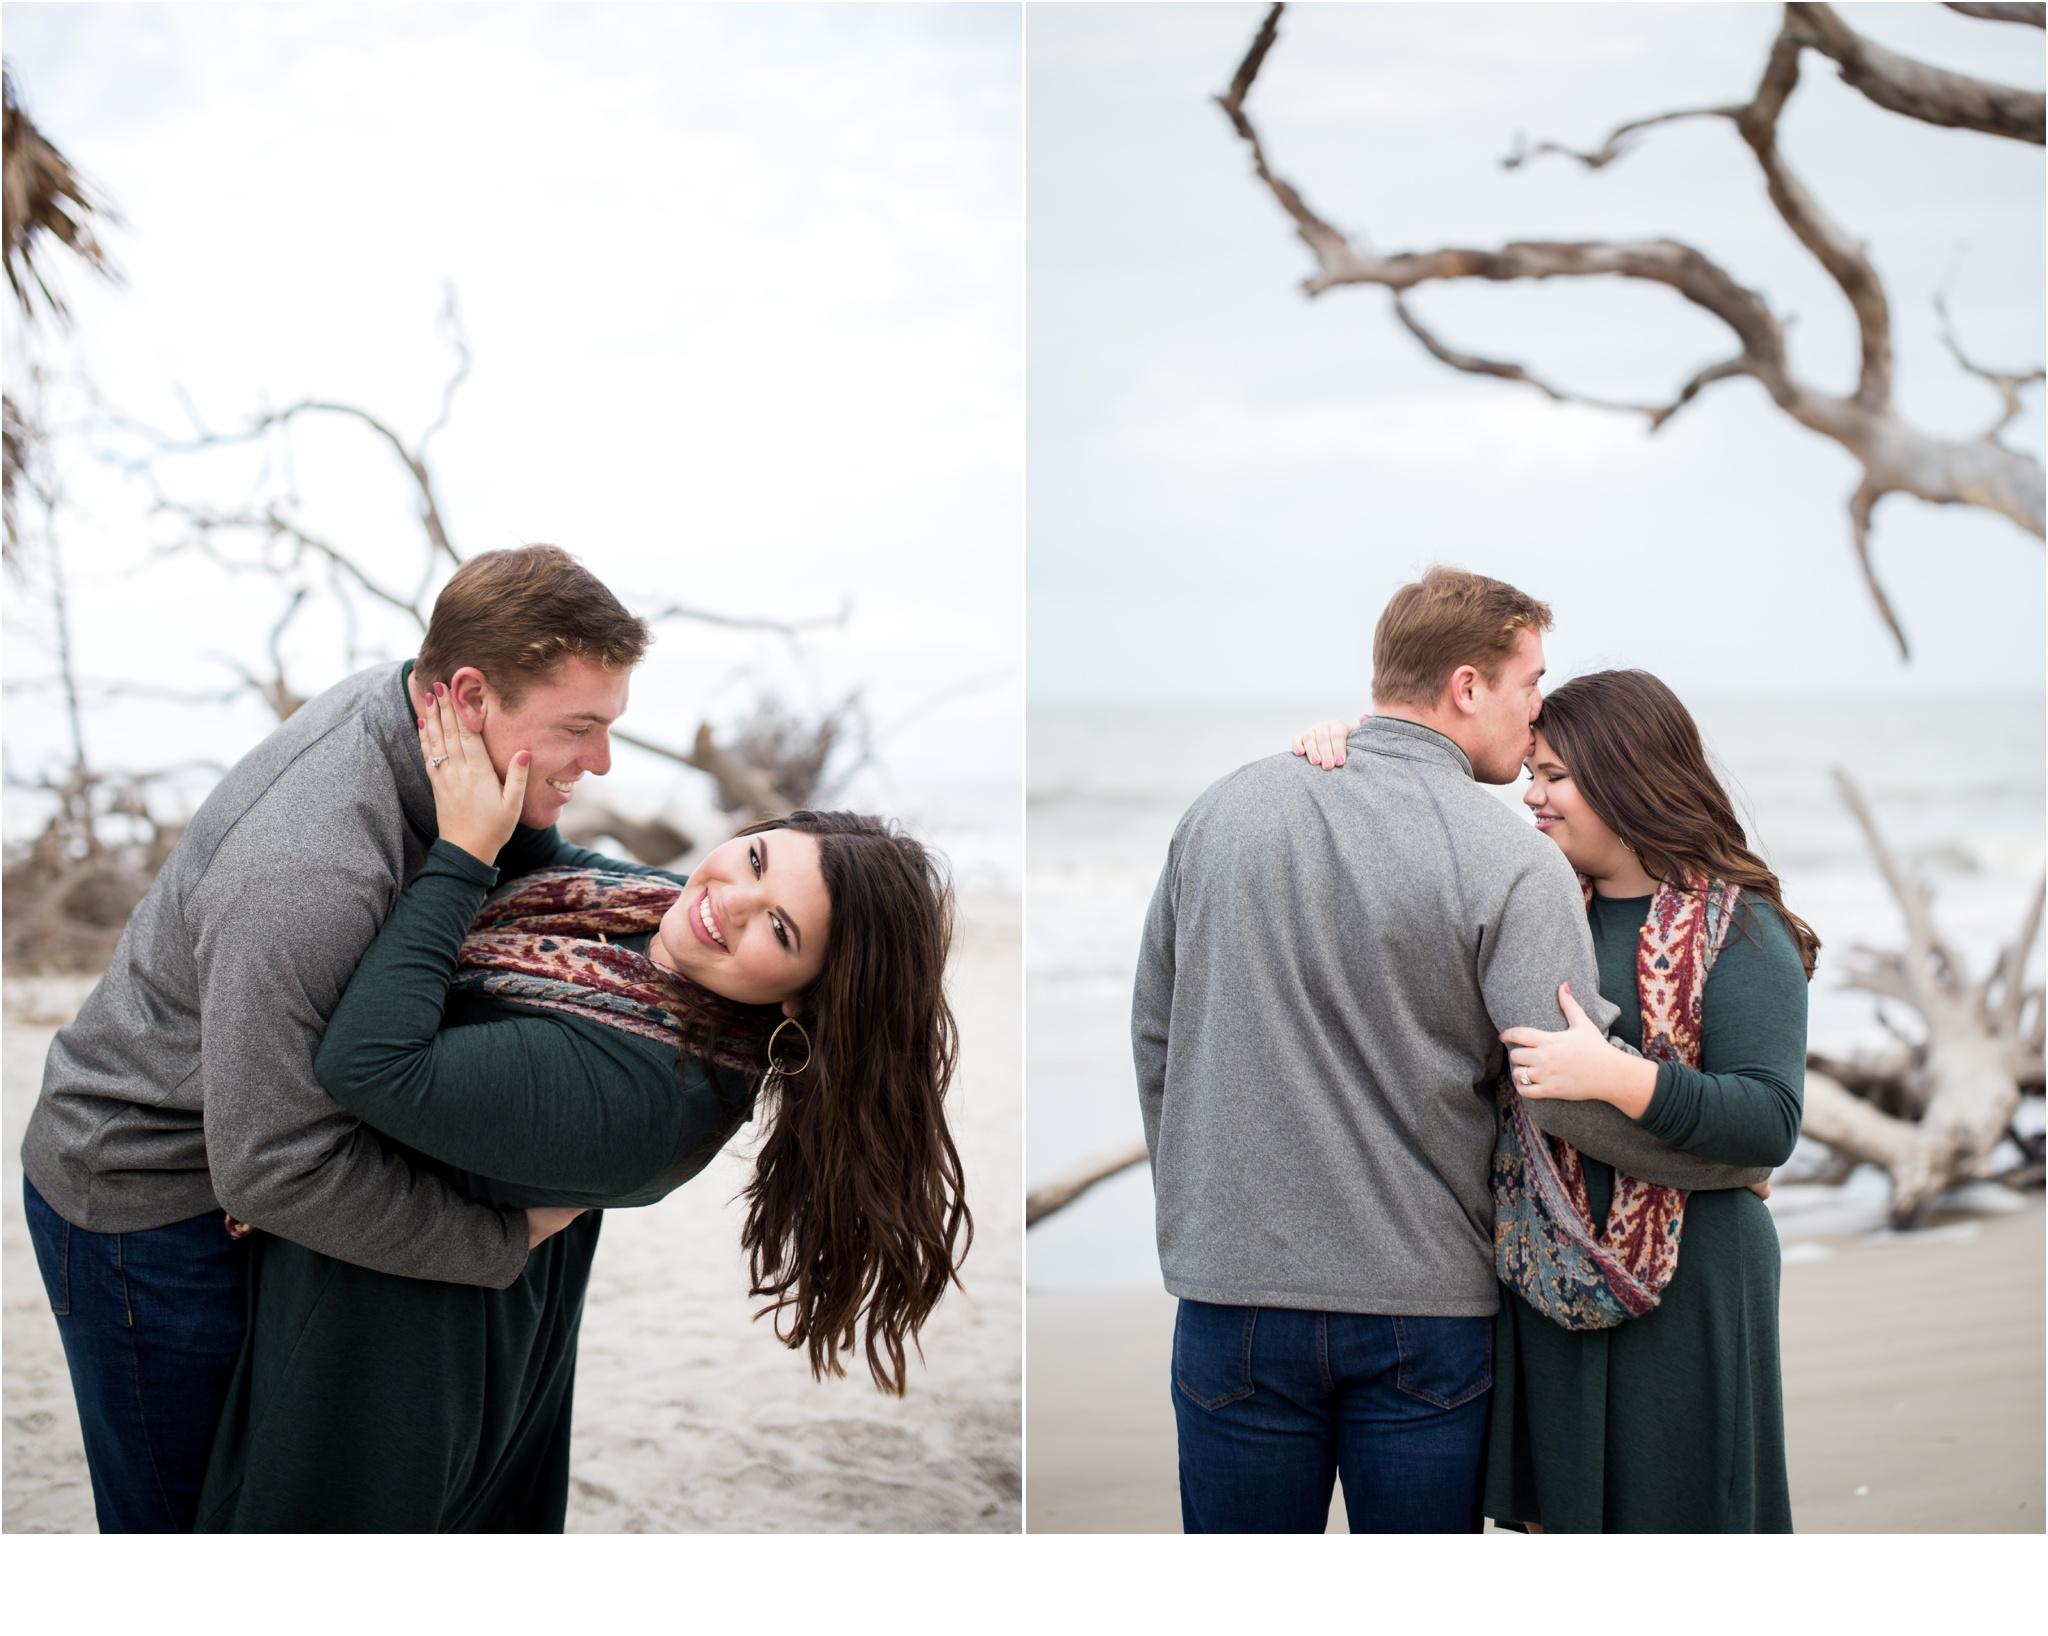 Rainey_Gregg_Photography_St._Simons_Island_Georgia_California_Wedding_Portrait_Photography_0590.jpg